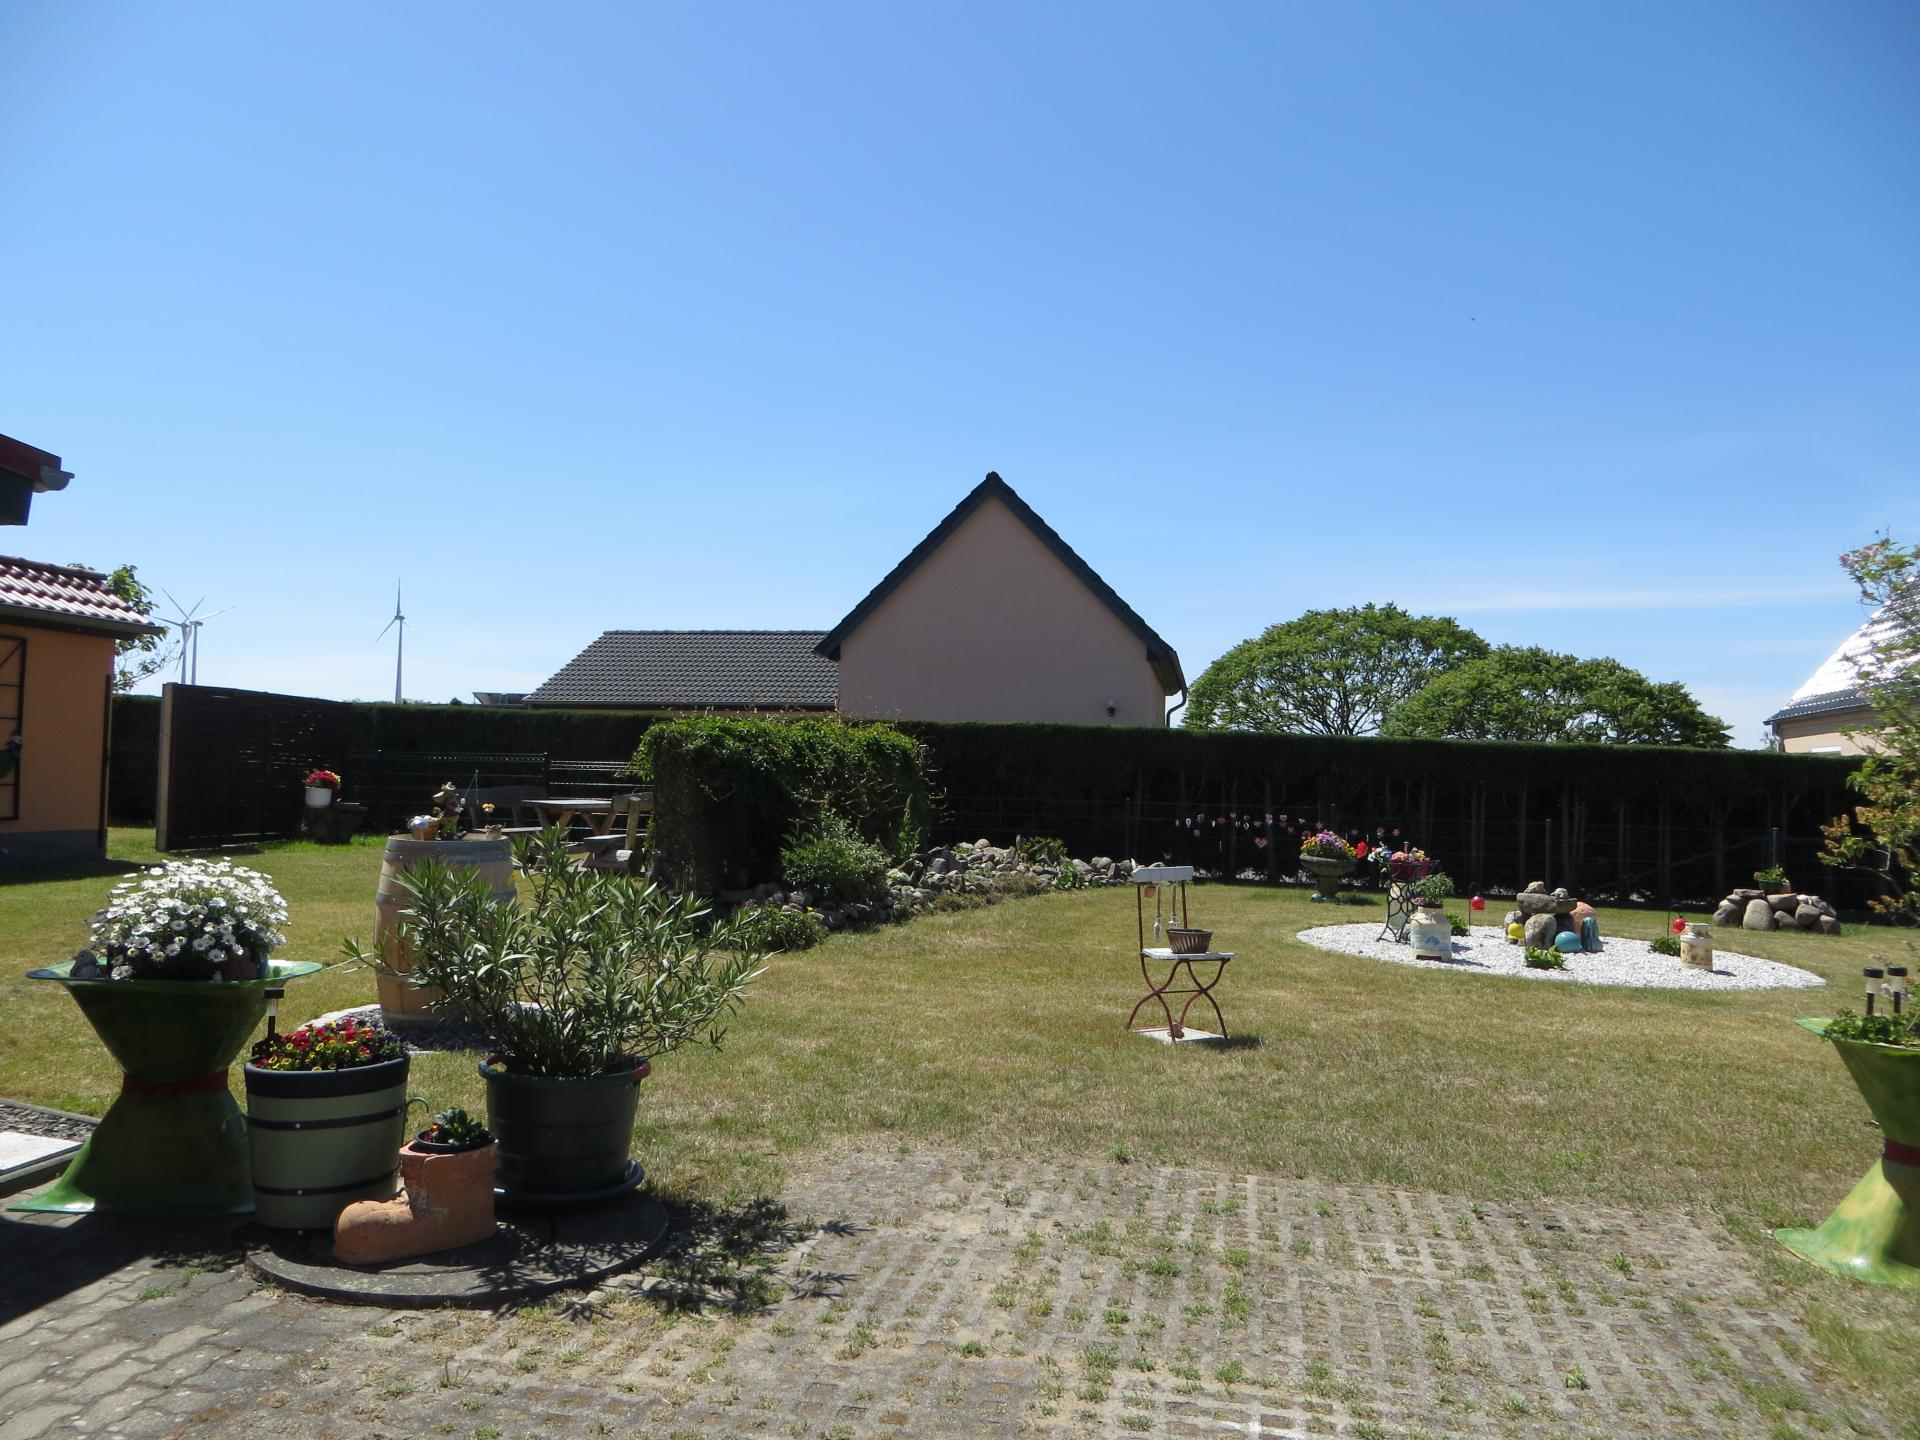 Blick auf dem Garten  Foto: Info Punkt Lebus